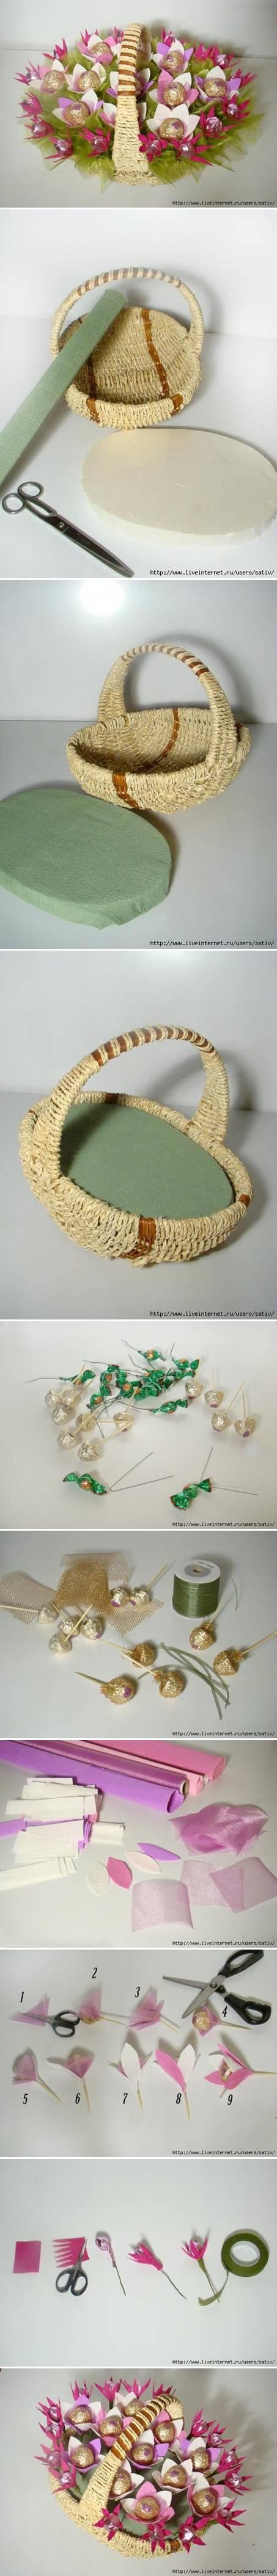 DIY Candy Bouquet Basket